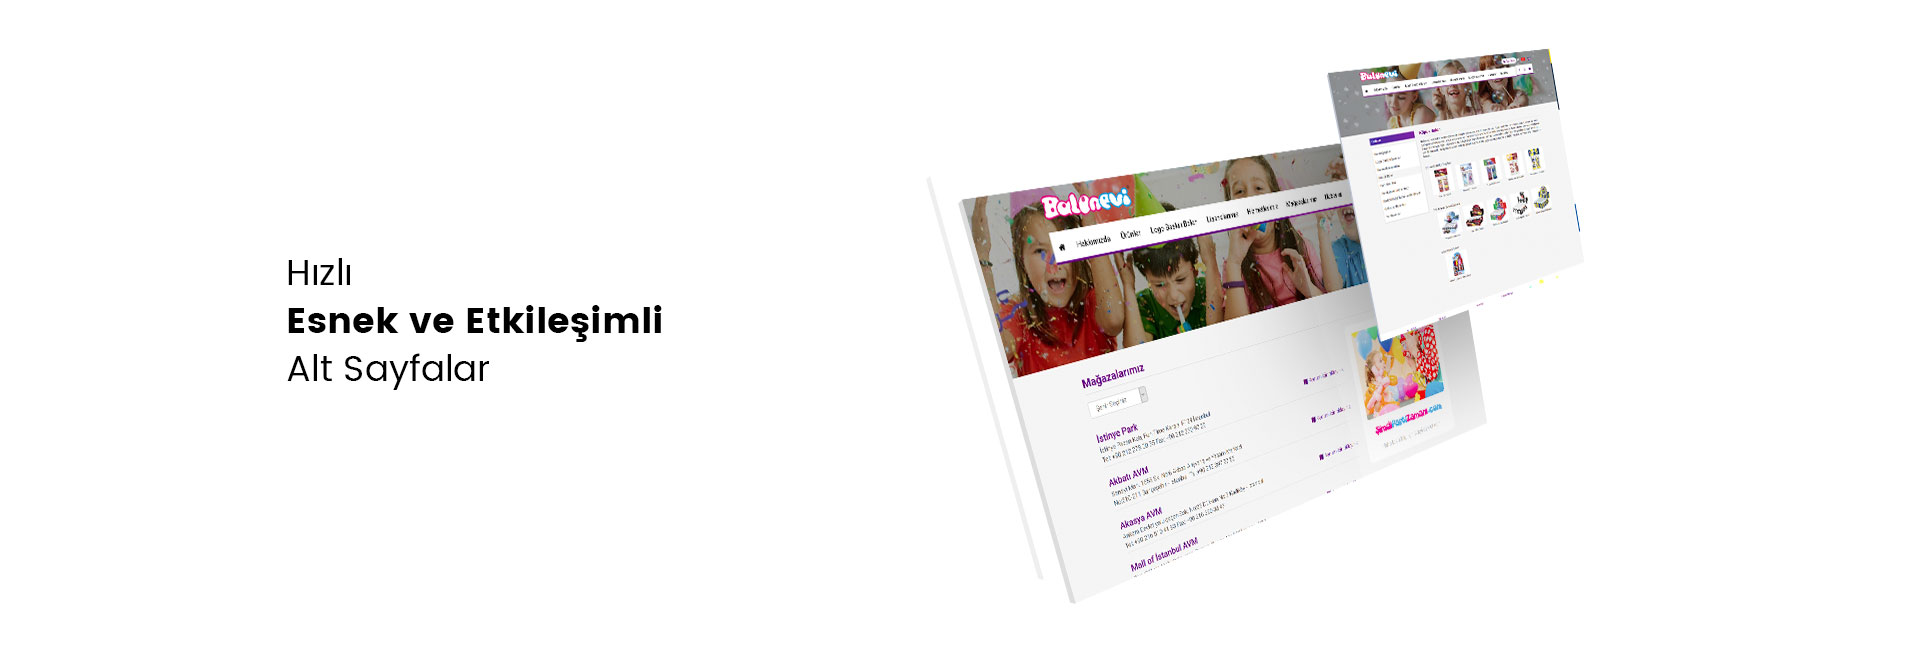 Balonevi Web Sitesi Responsive